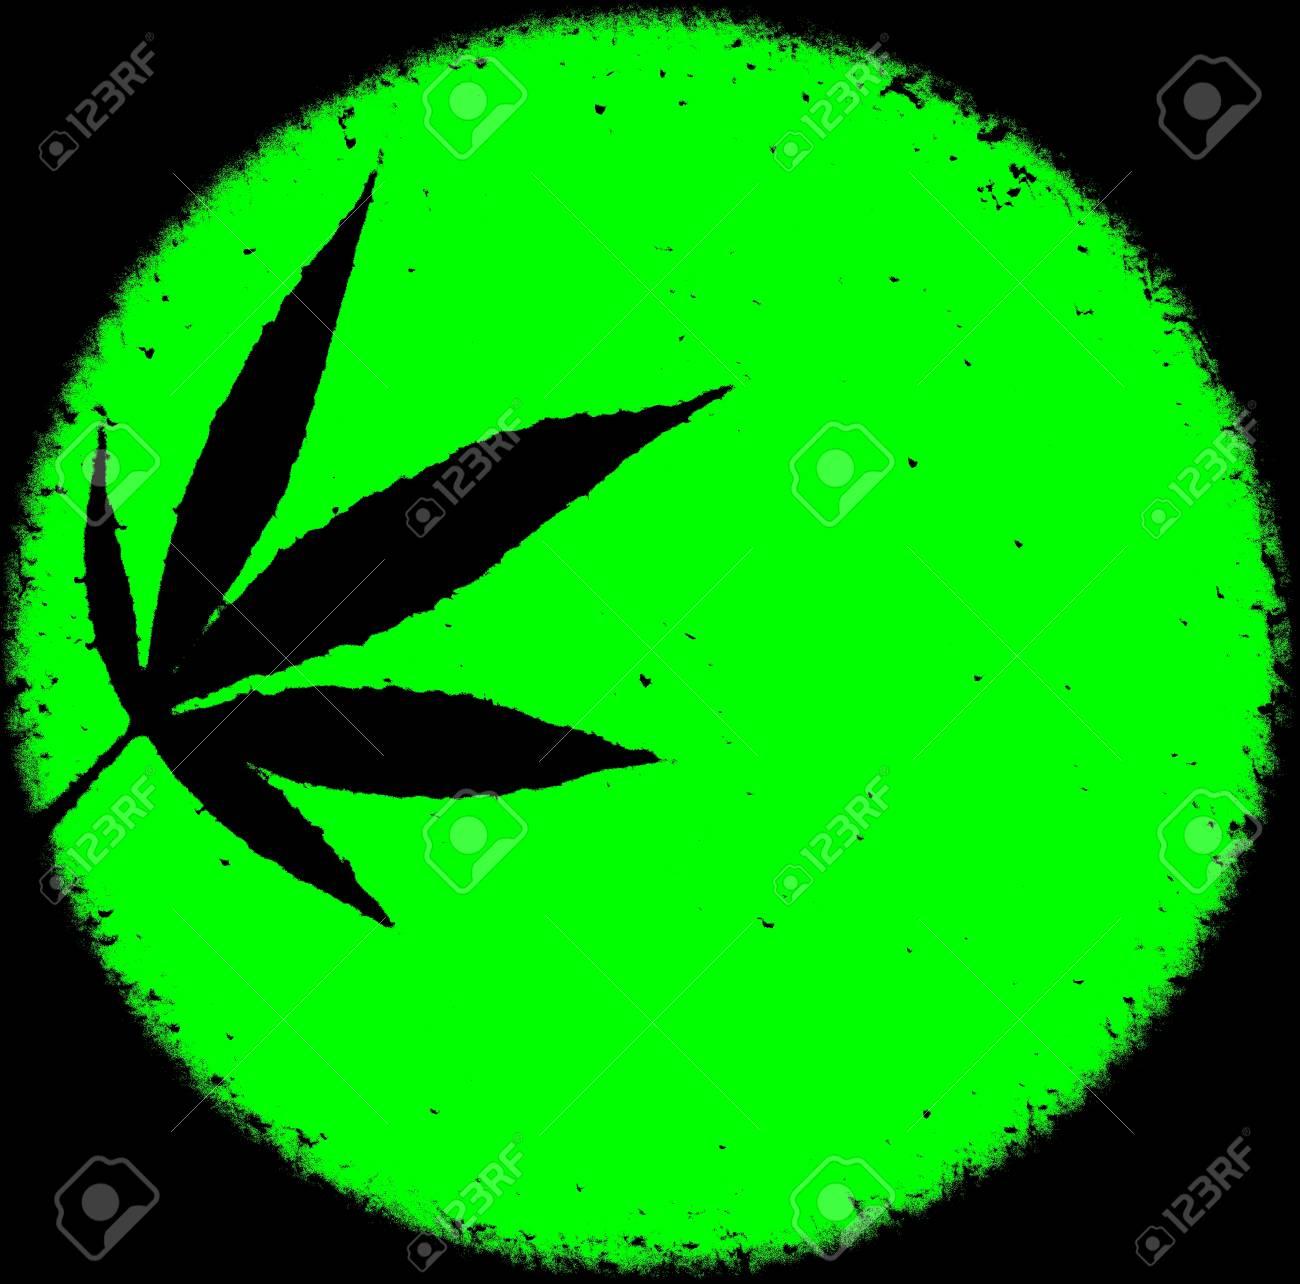 Neon Bright Green Marijuana Ganja Circle Grunge Messy Background